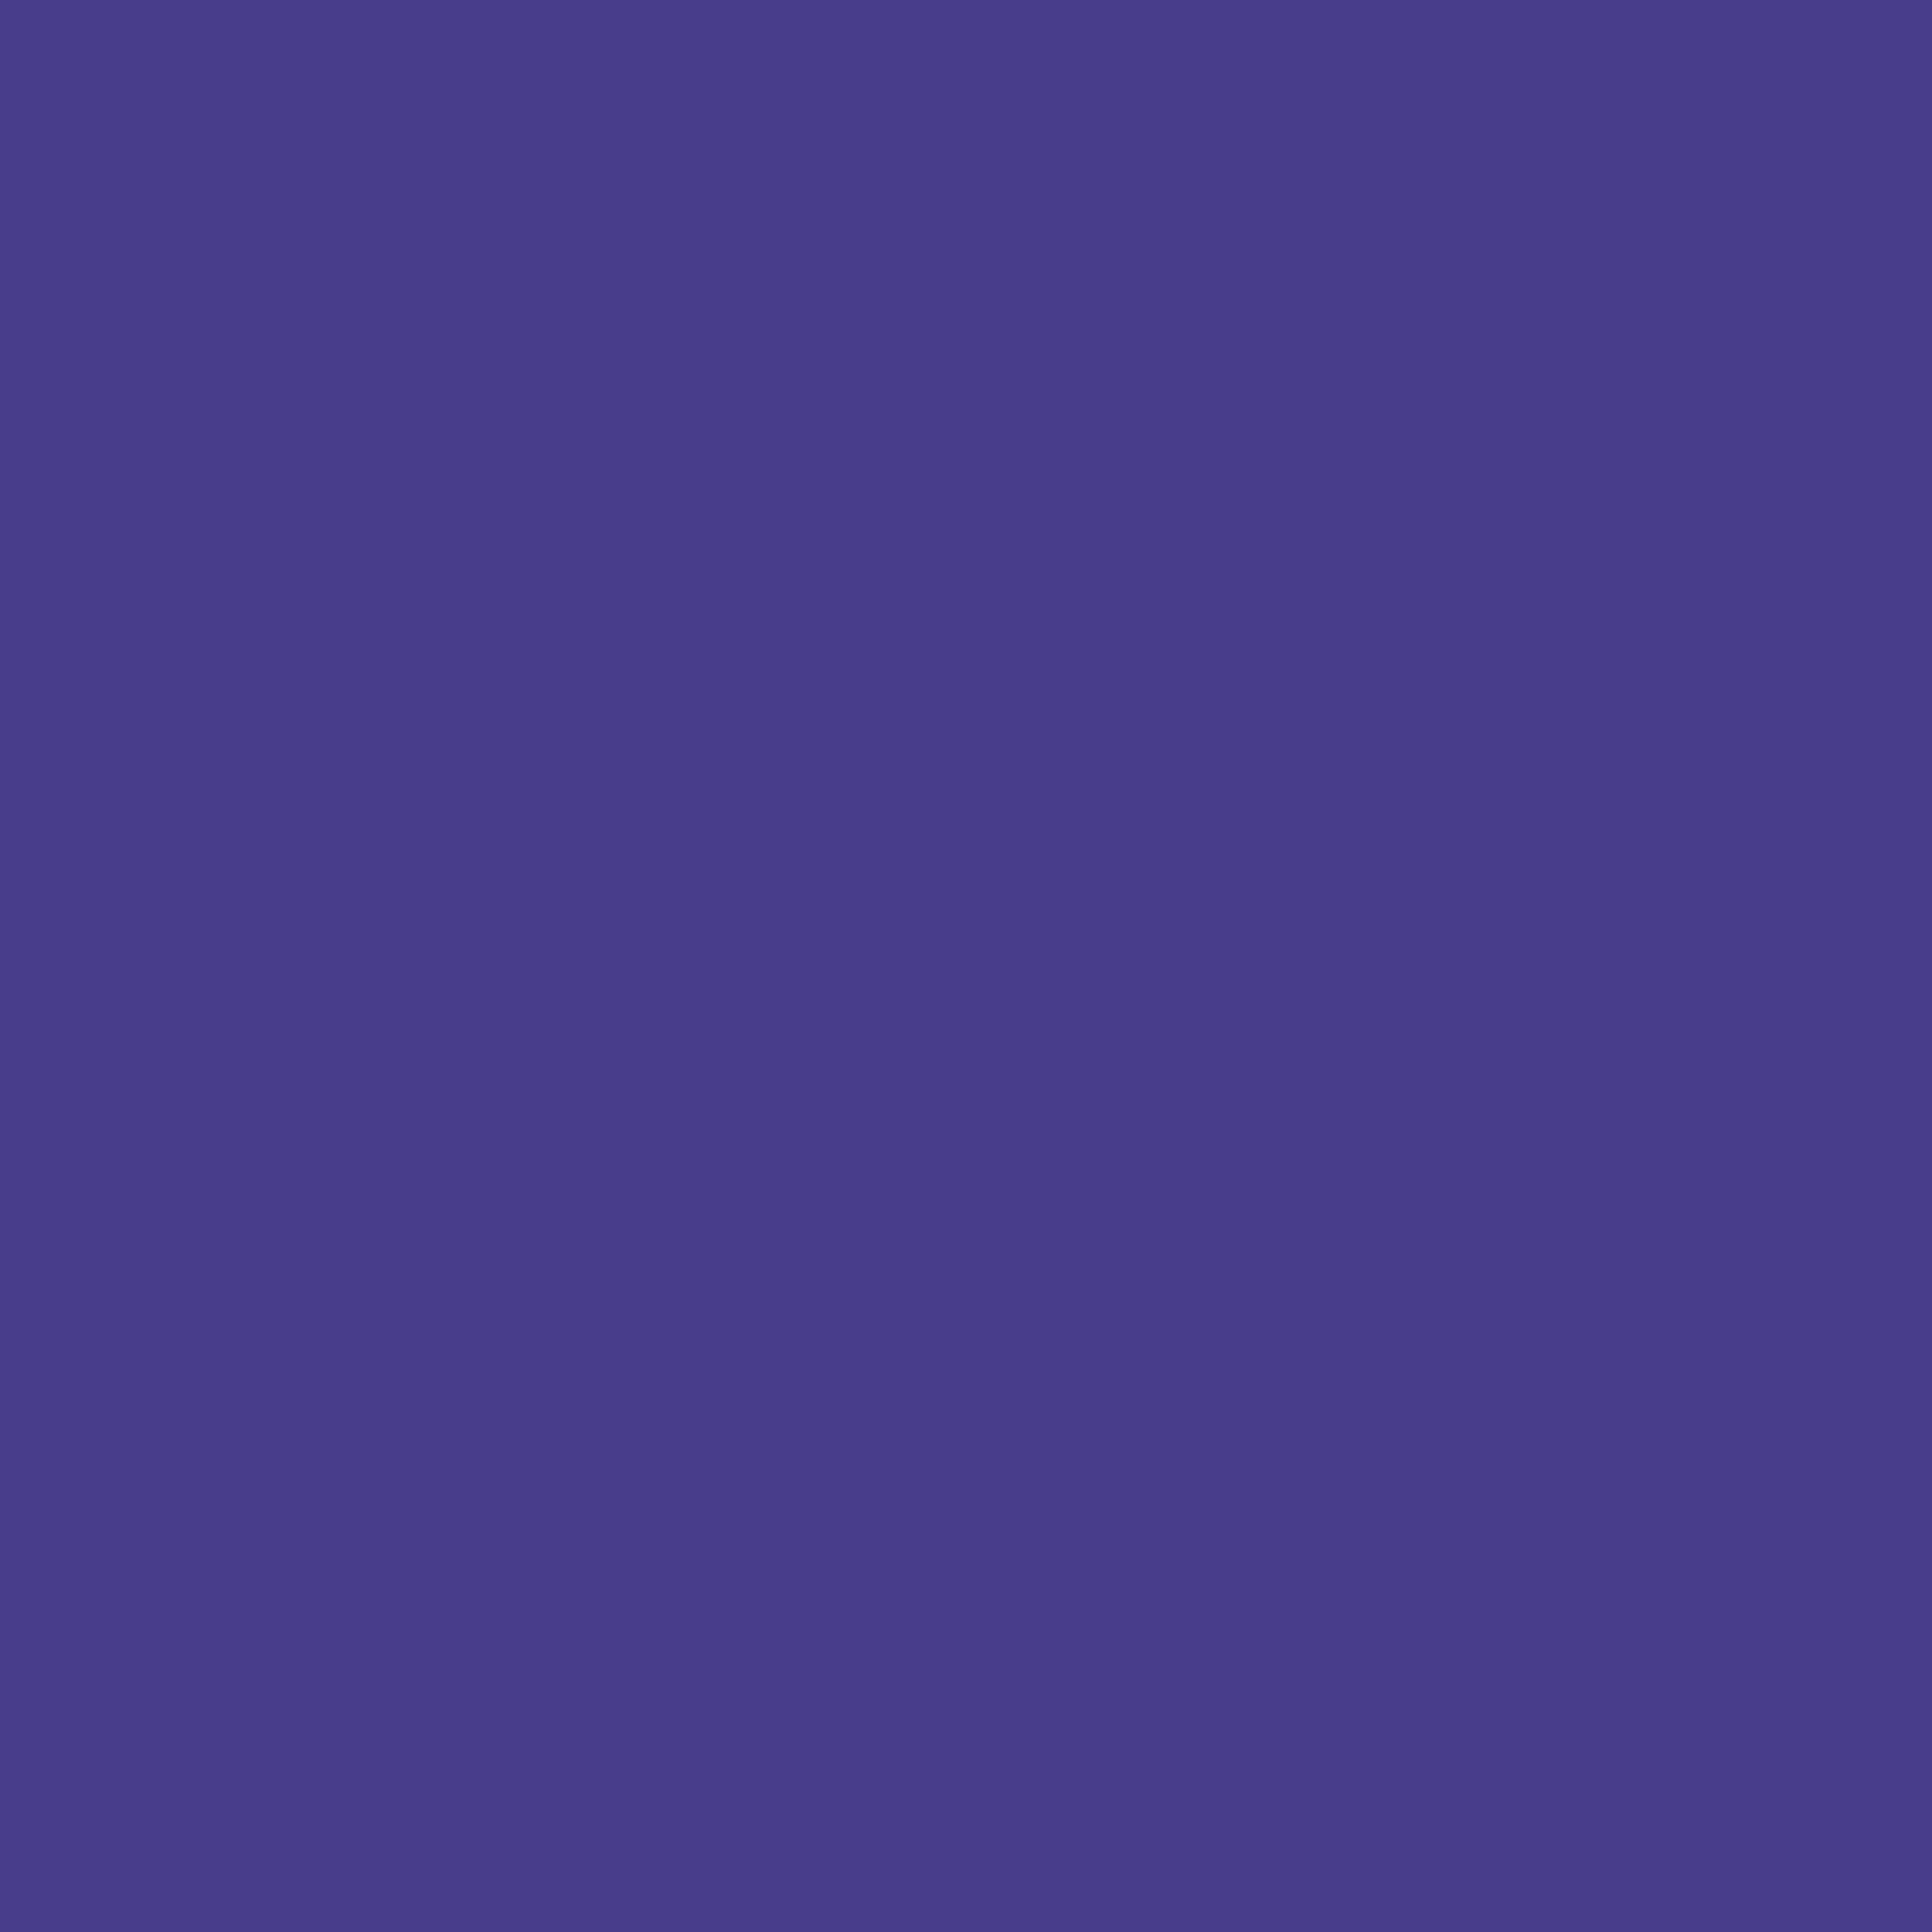 2048x2048 Dark Slate Blue Solid Color Background